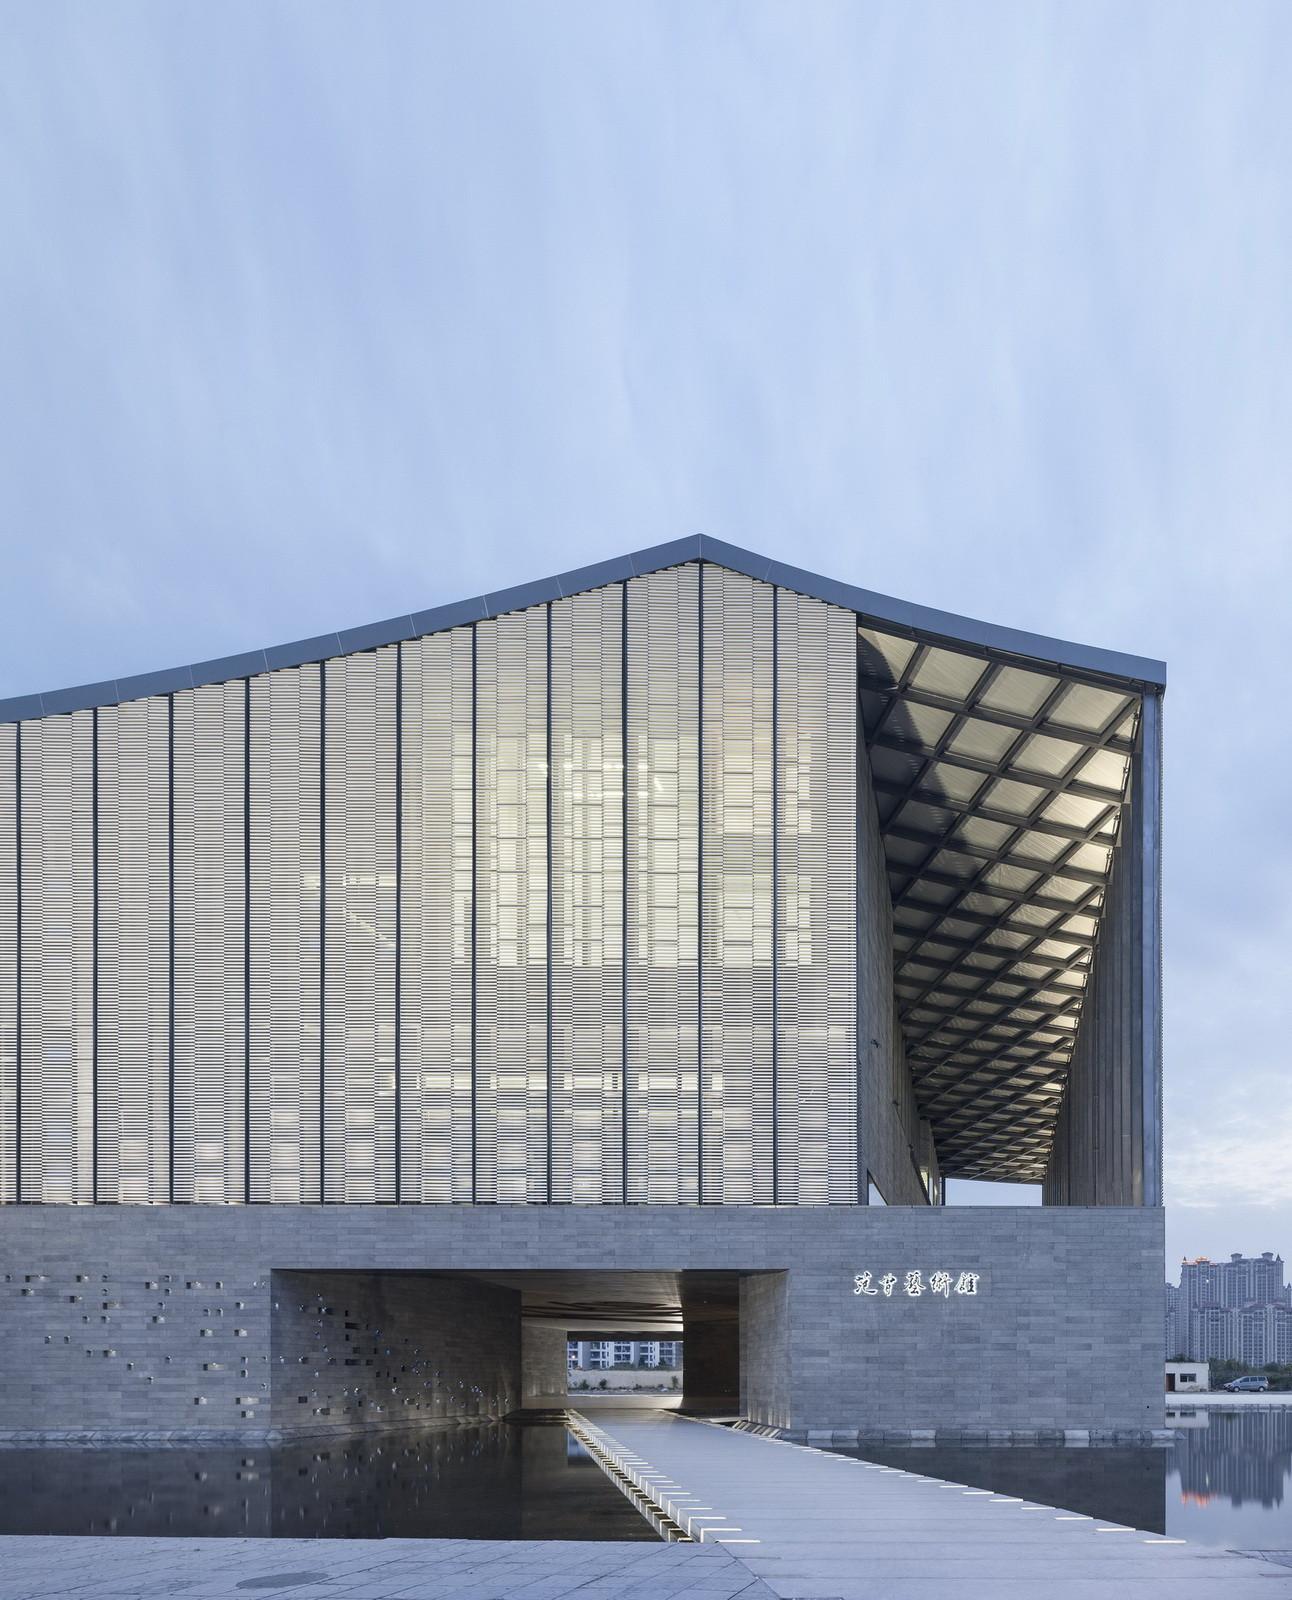 Fan zeng art gallery original design studio archdaily for Origine architecture